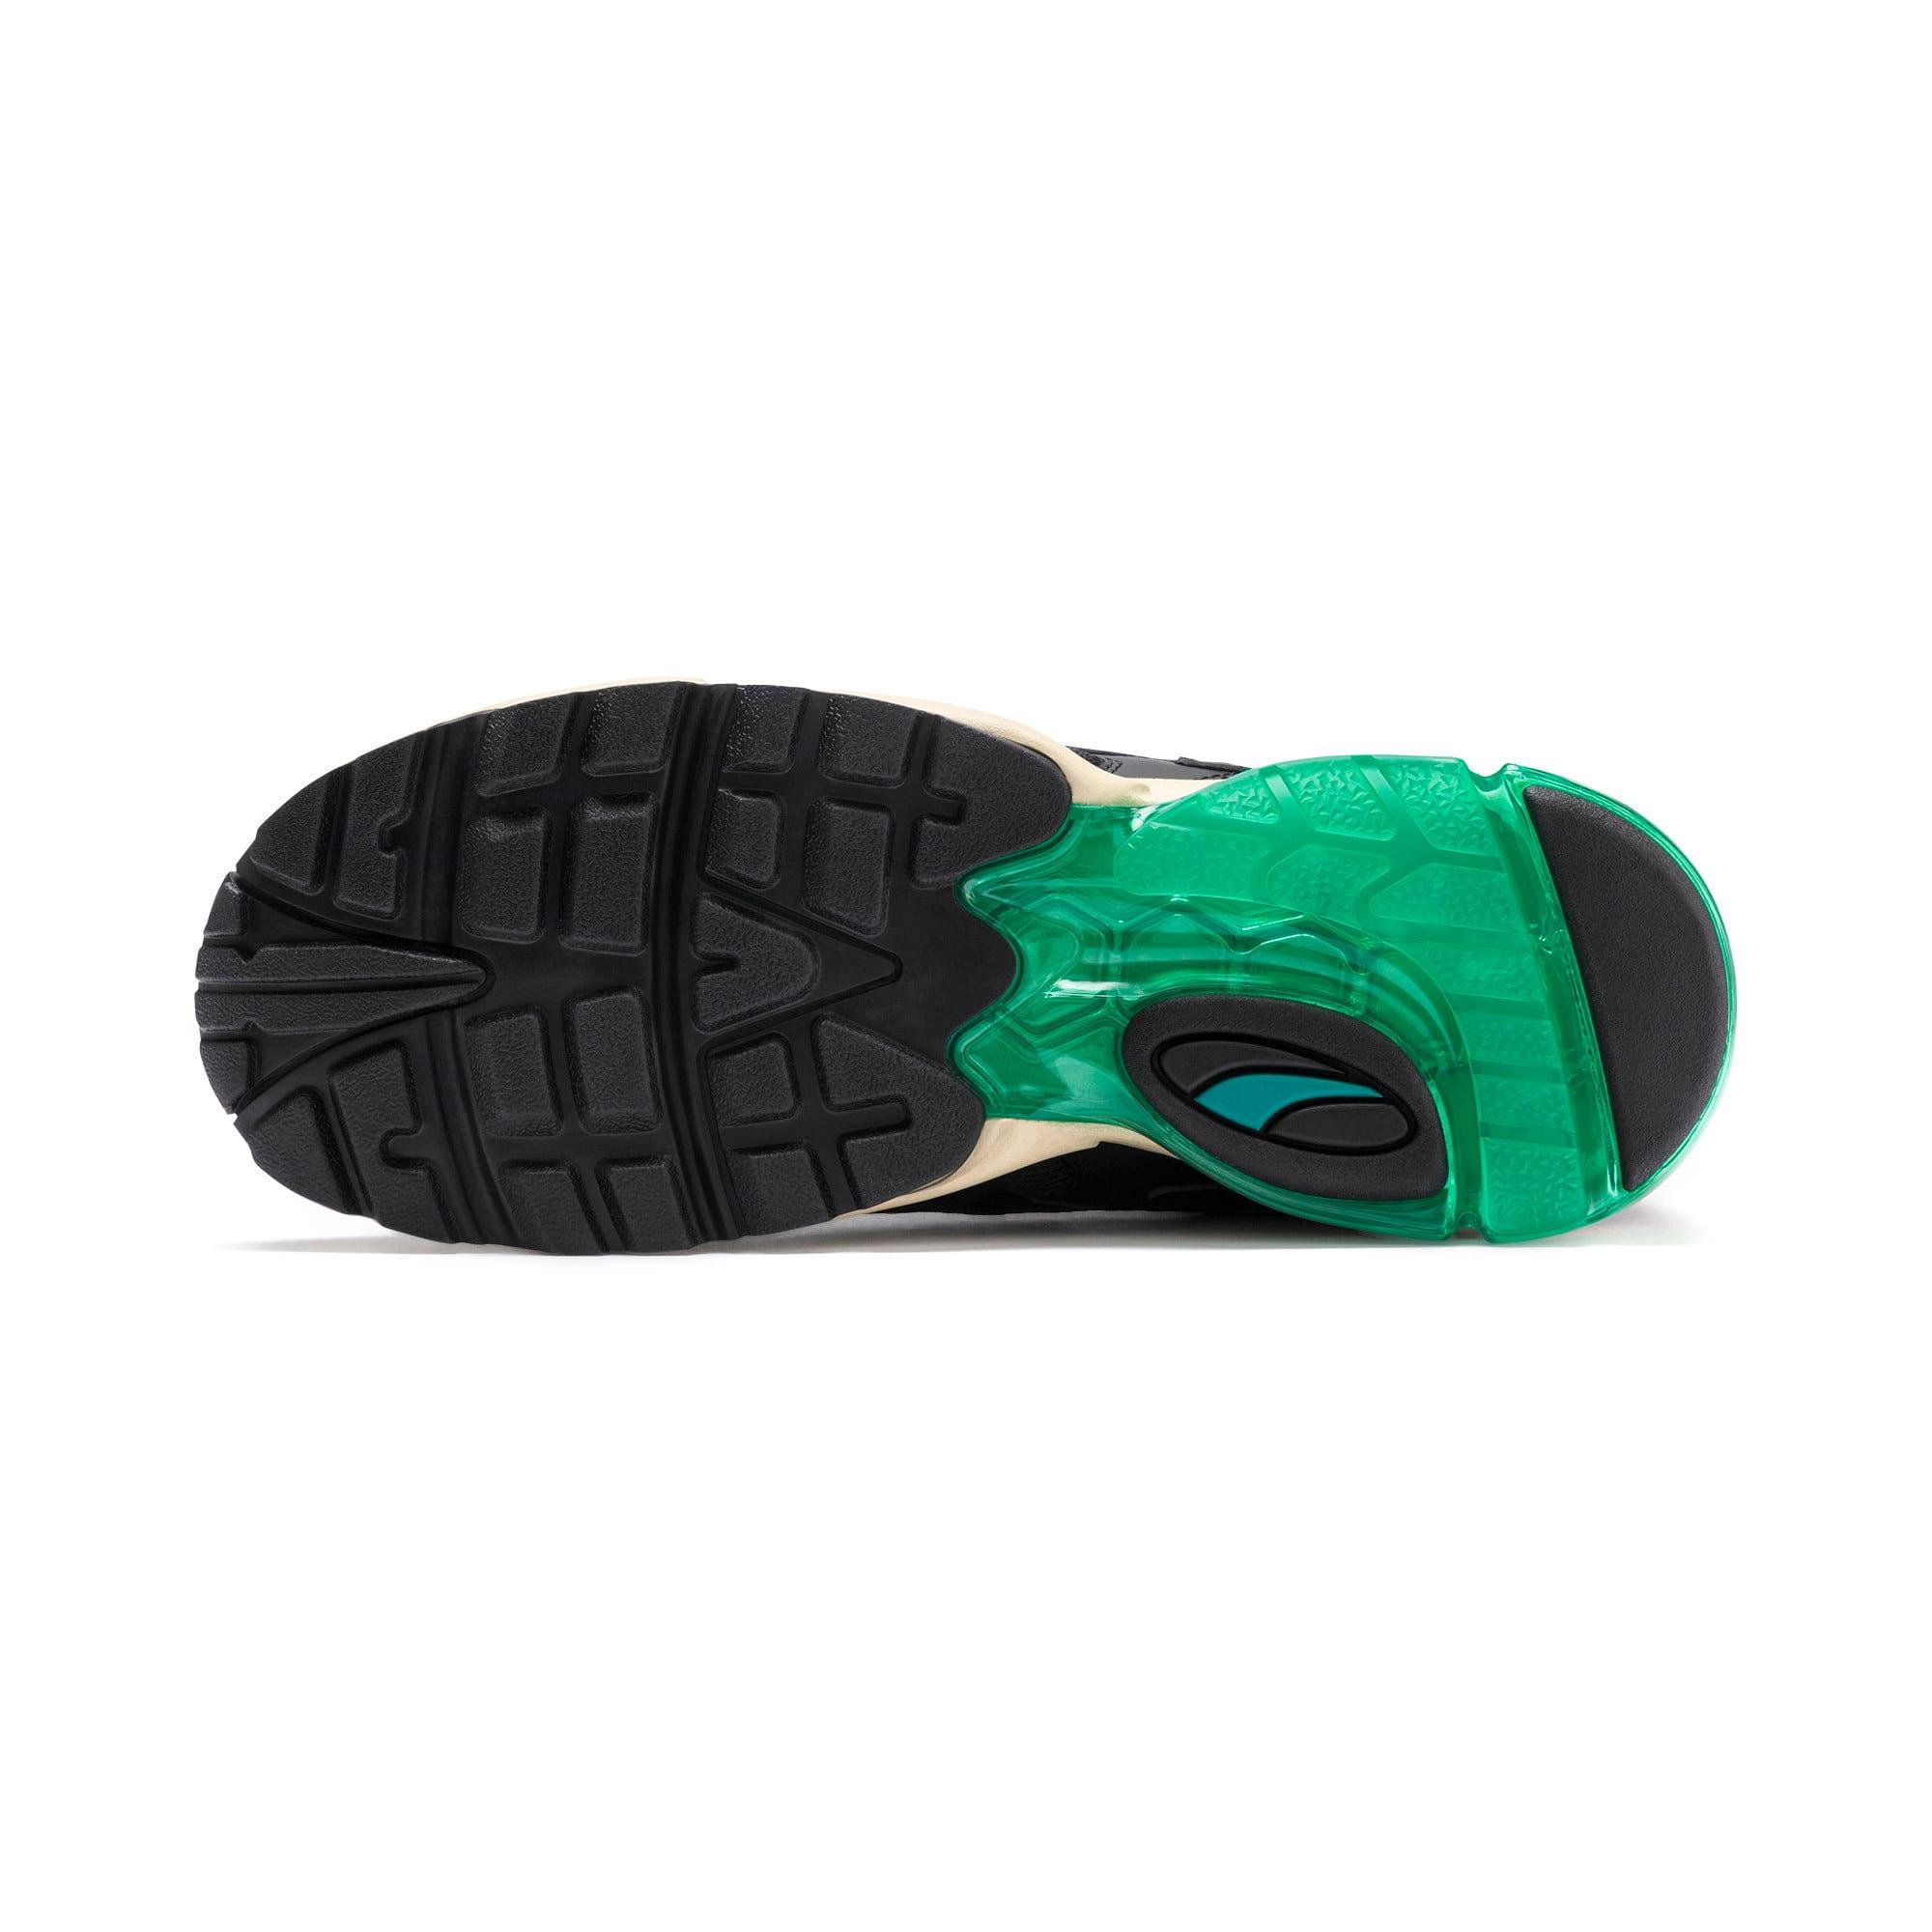 Thumbnail 4 of PUMA x Rhude CELL Alien sportschoenen, Puma Black-Puma Black, medium